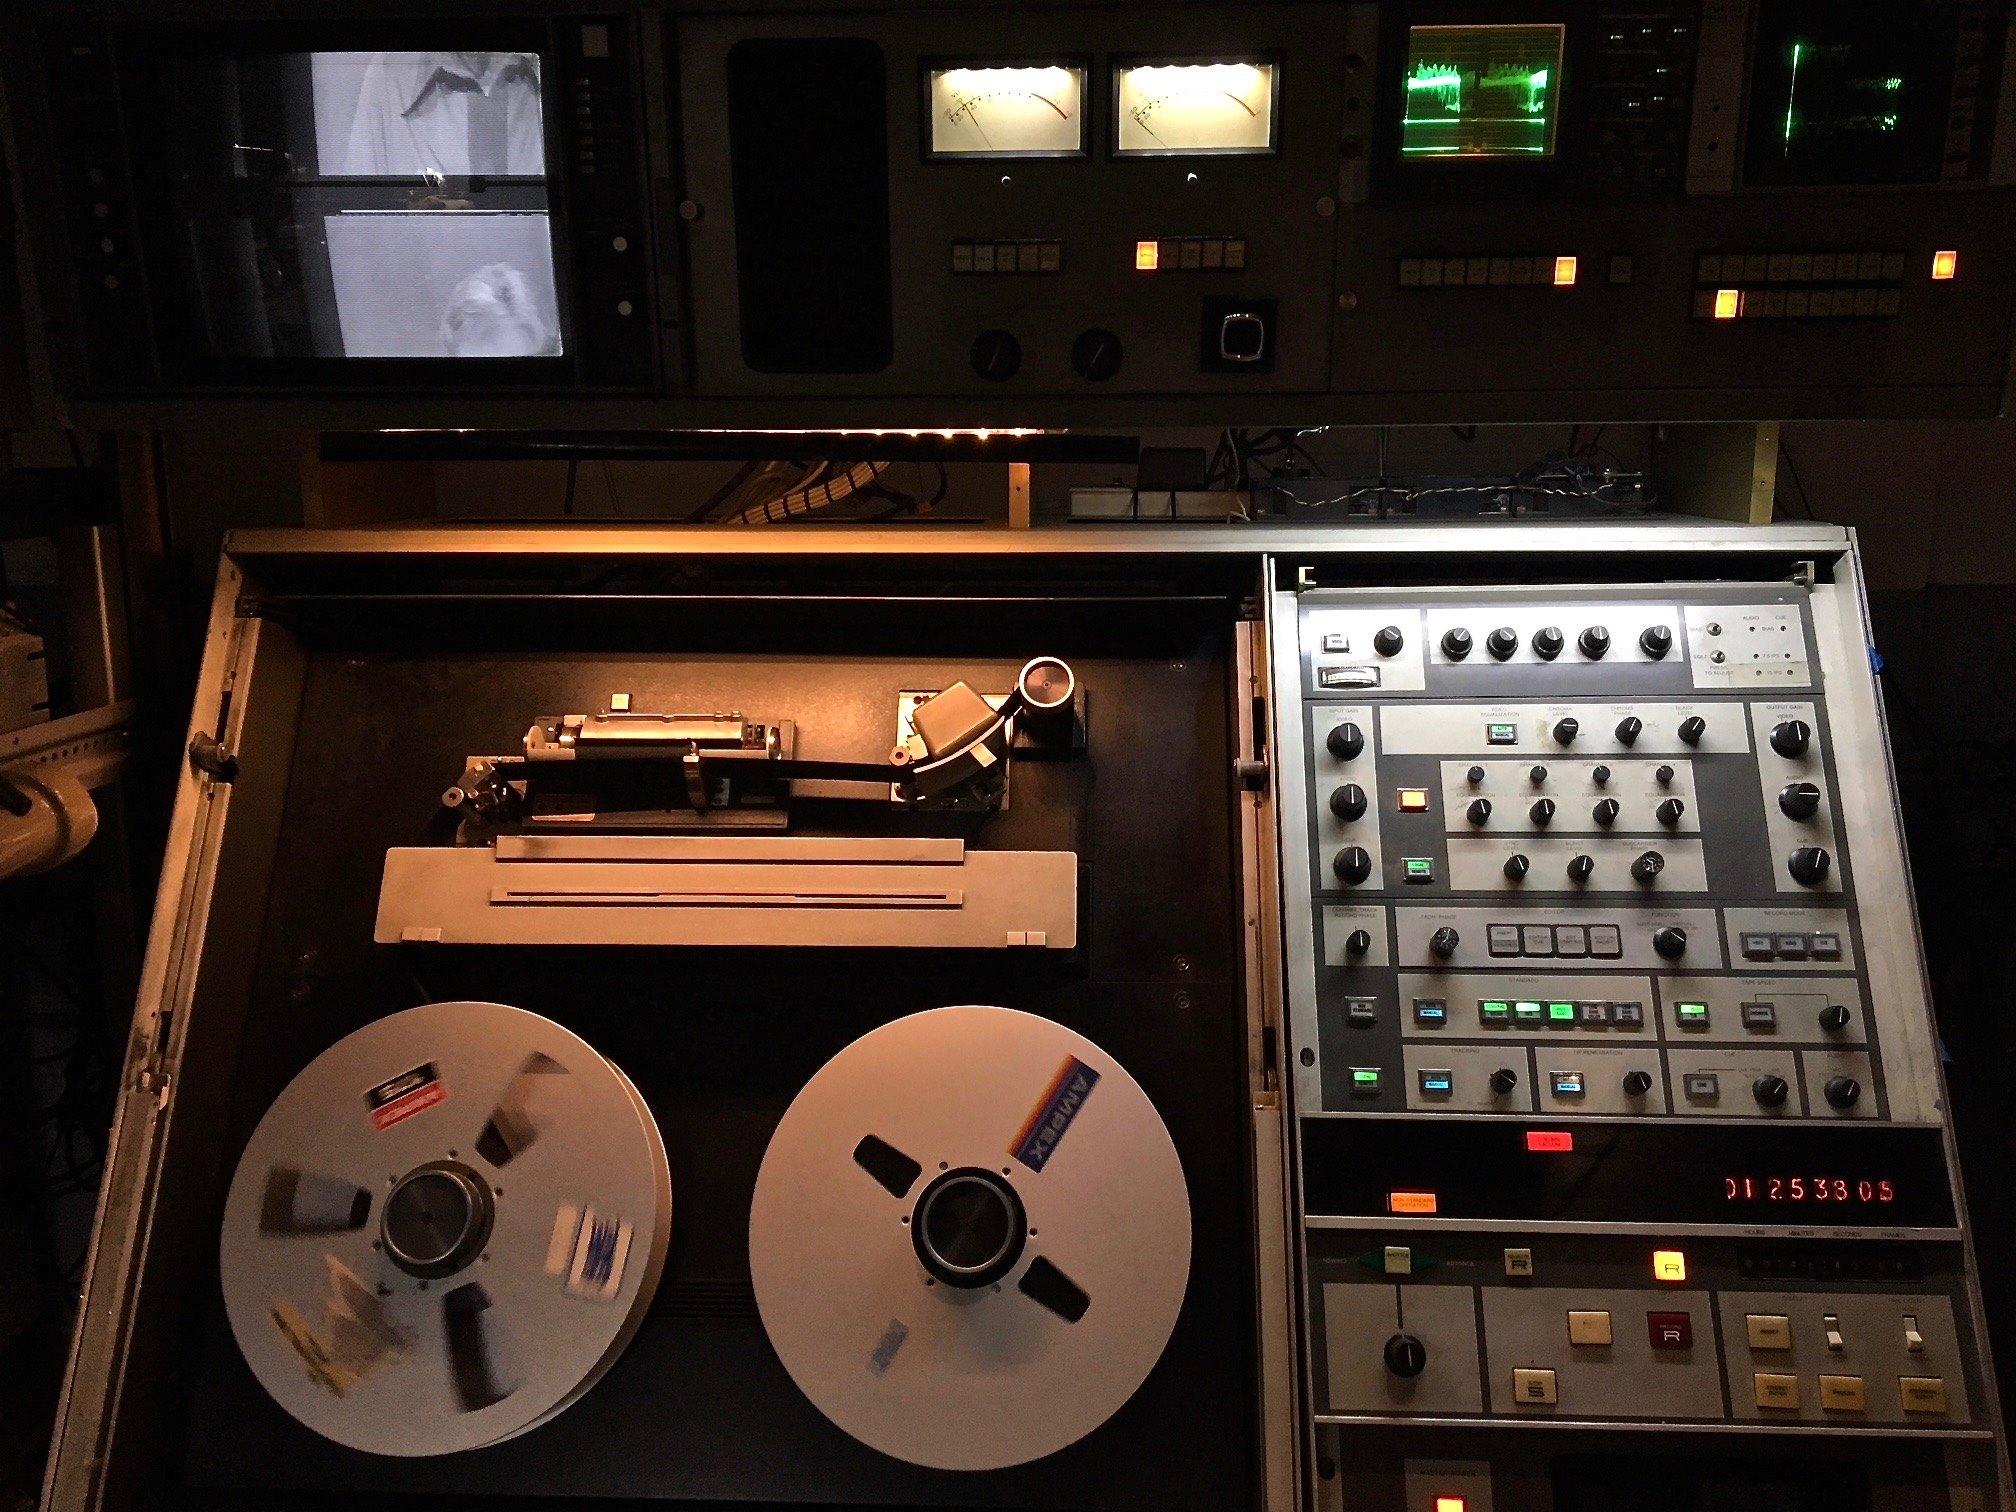 AVR-1 Quad videotape recorder